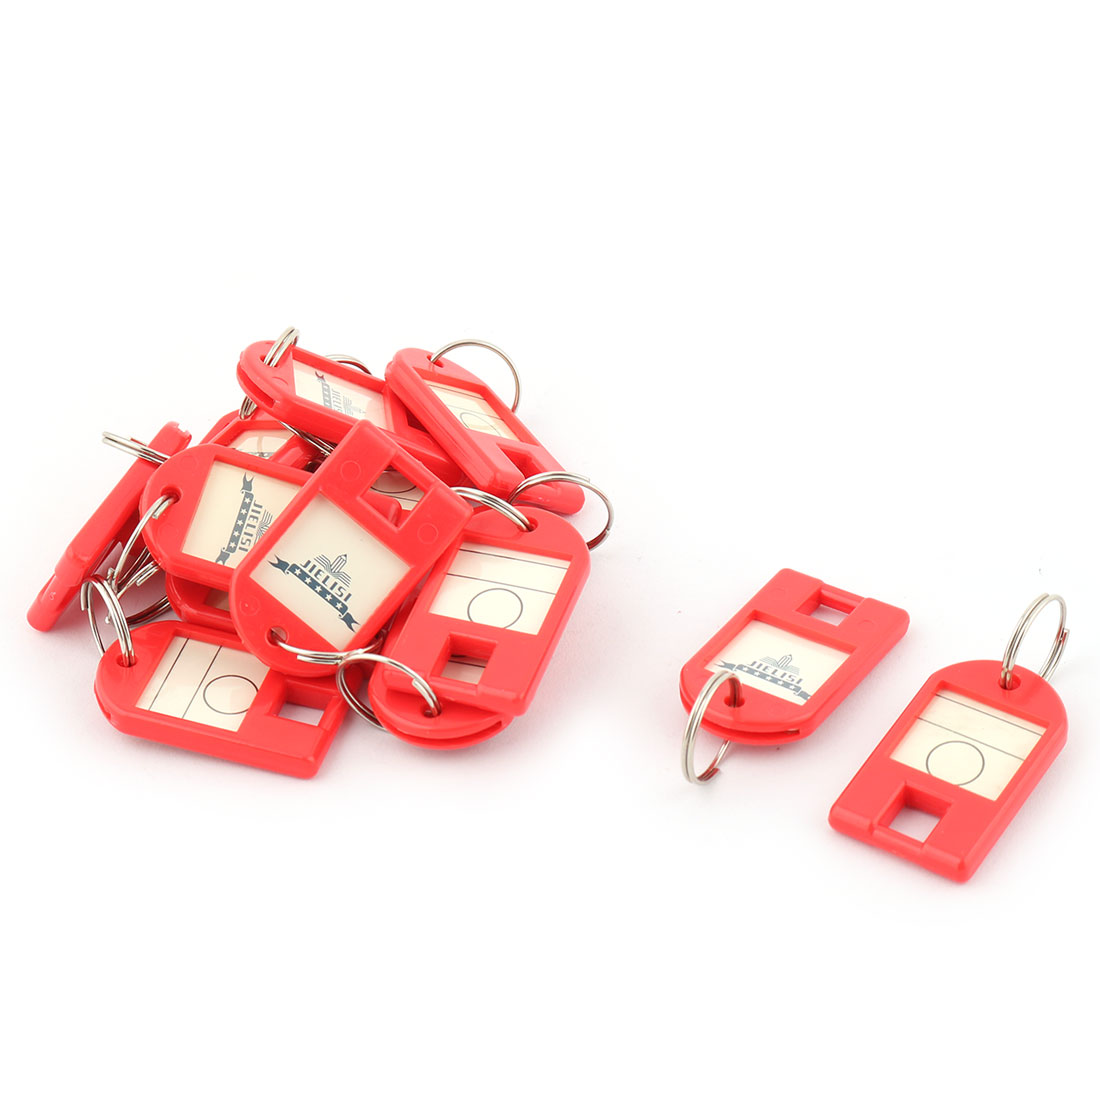 Metal Ring ID Label Name Tag Key Fobs Luggage Bag Marking Keyring Keychain Red 15pcs